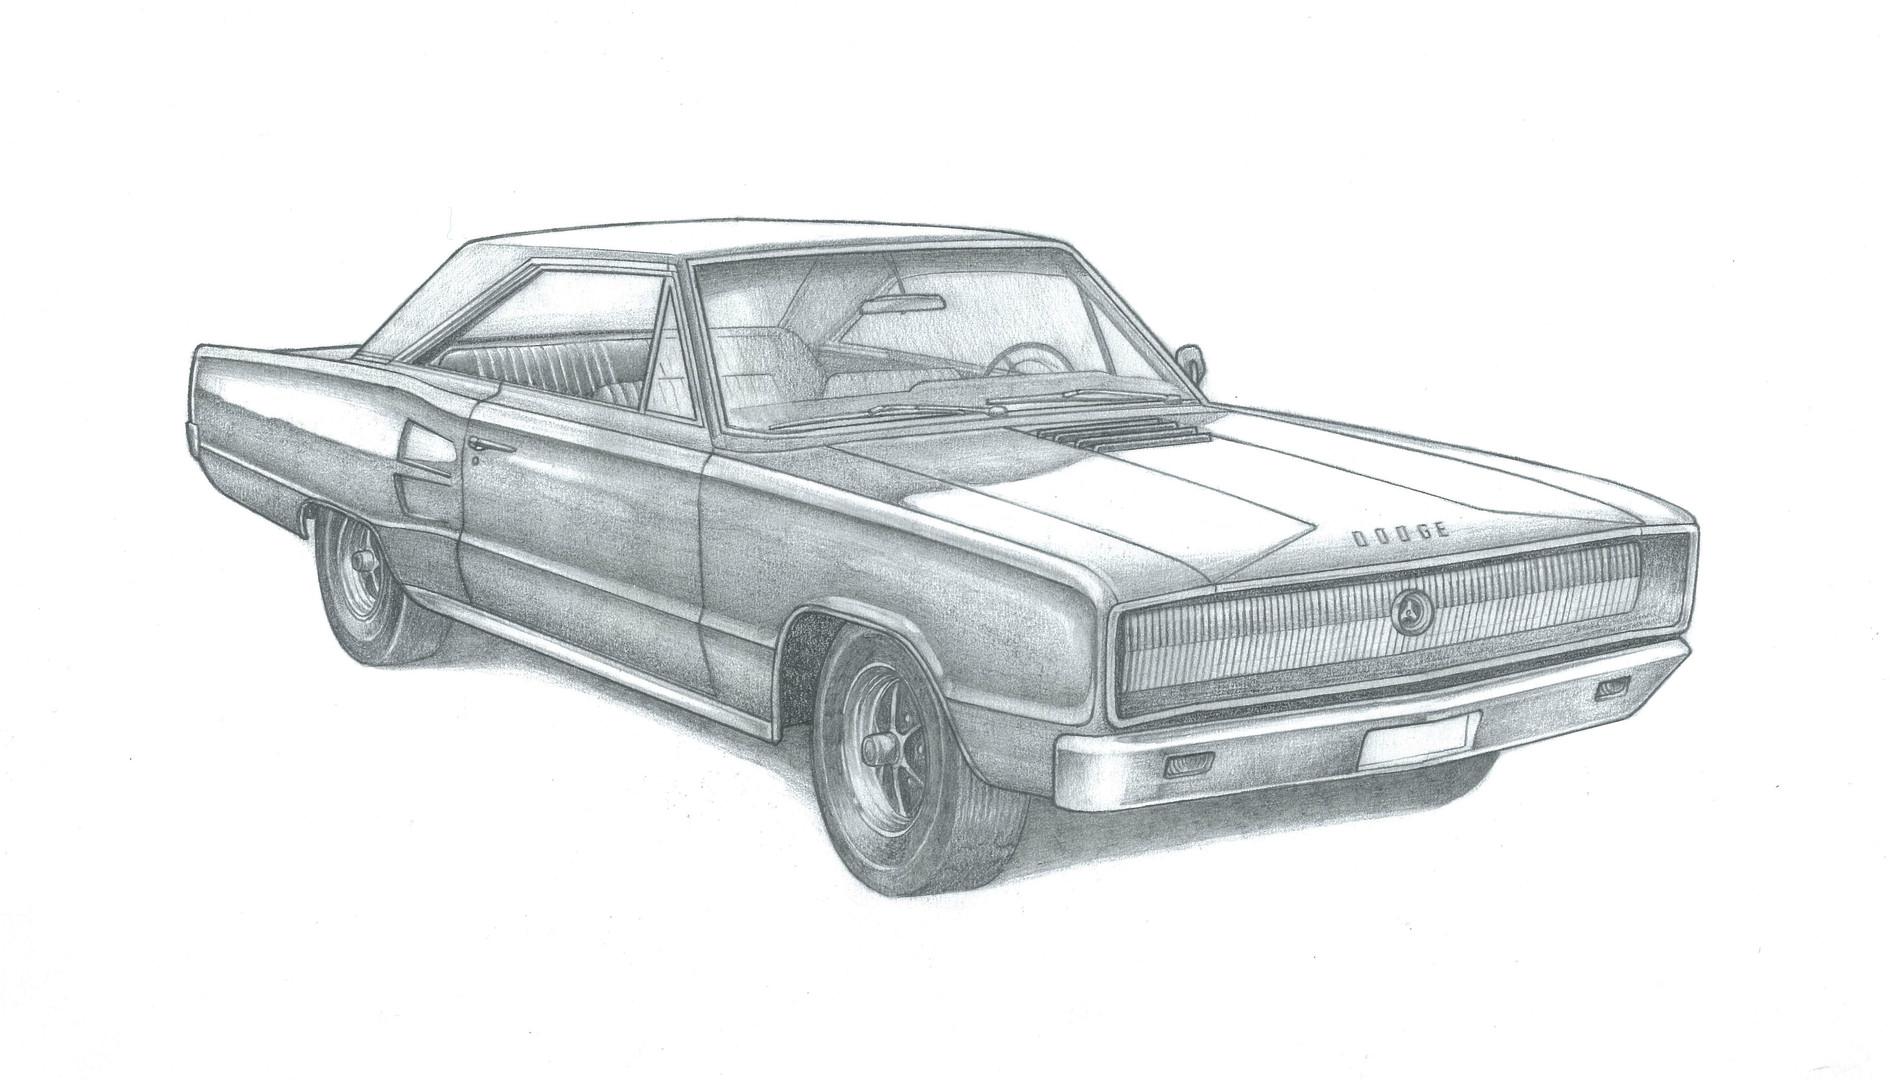 Dodge Coronet RT illustration